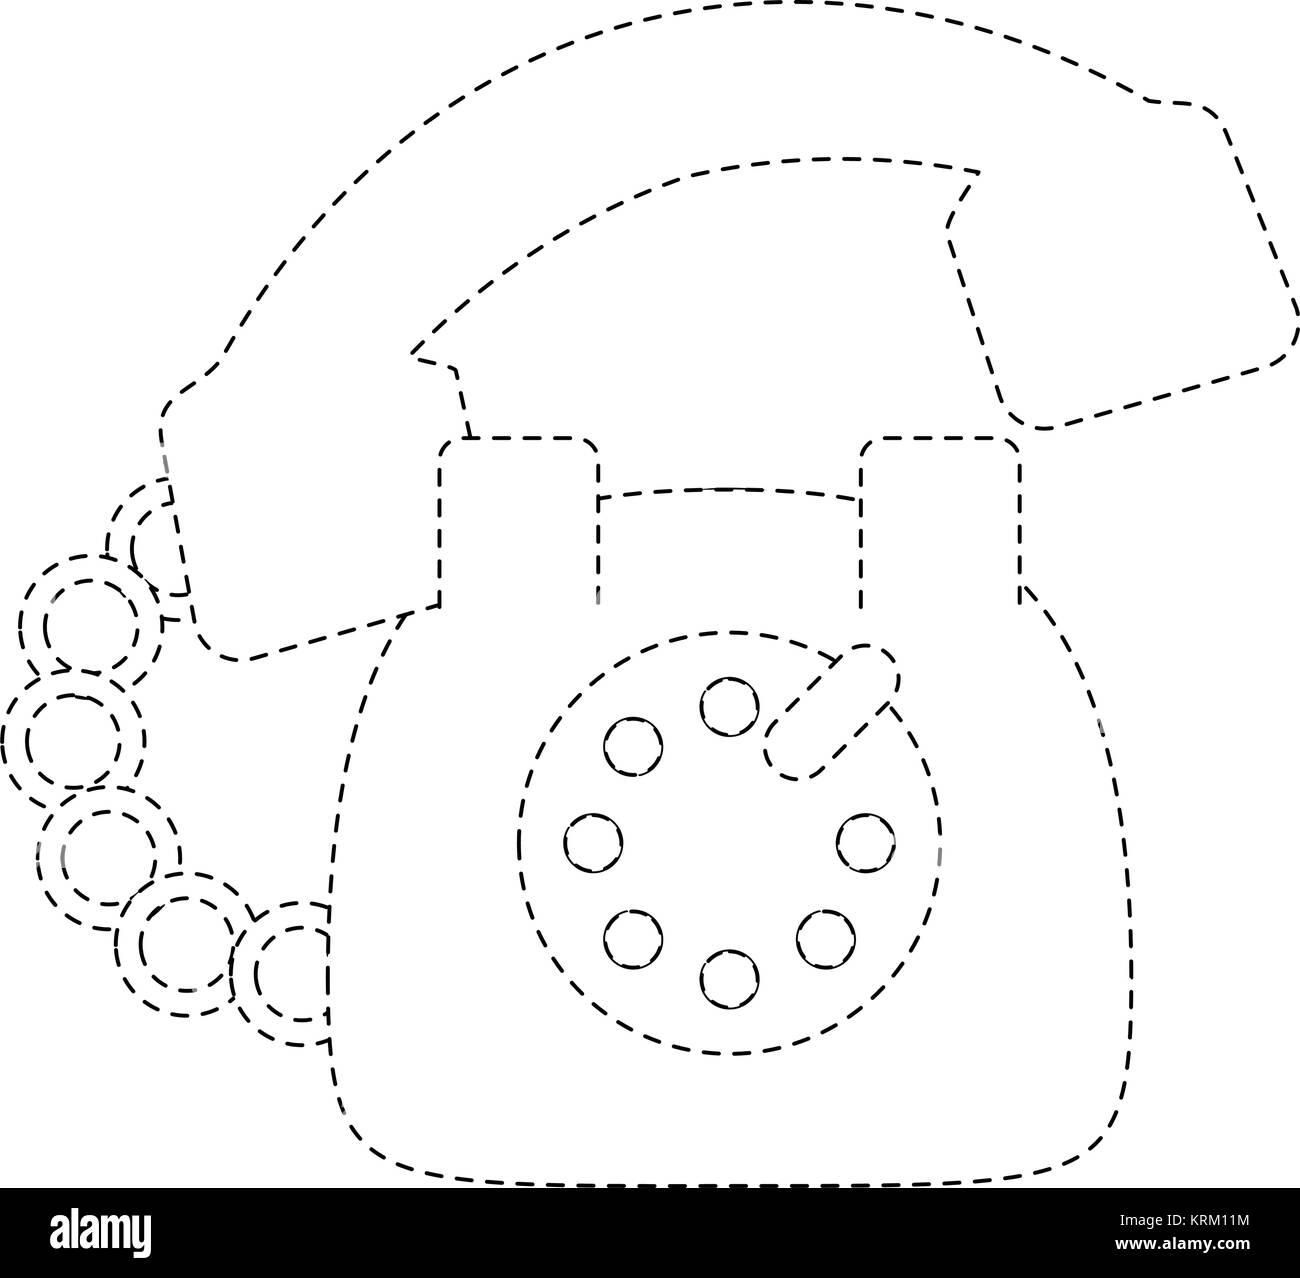 hight resolution of vintage telephone symbol stock image